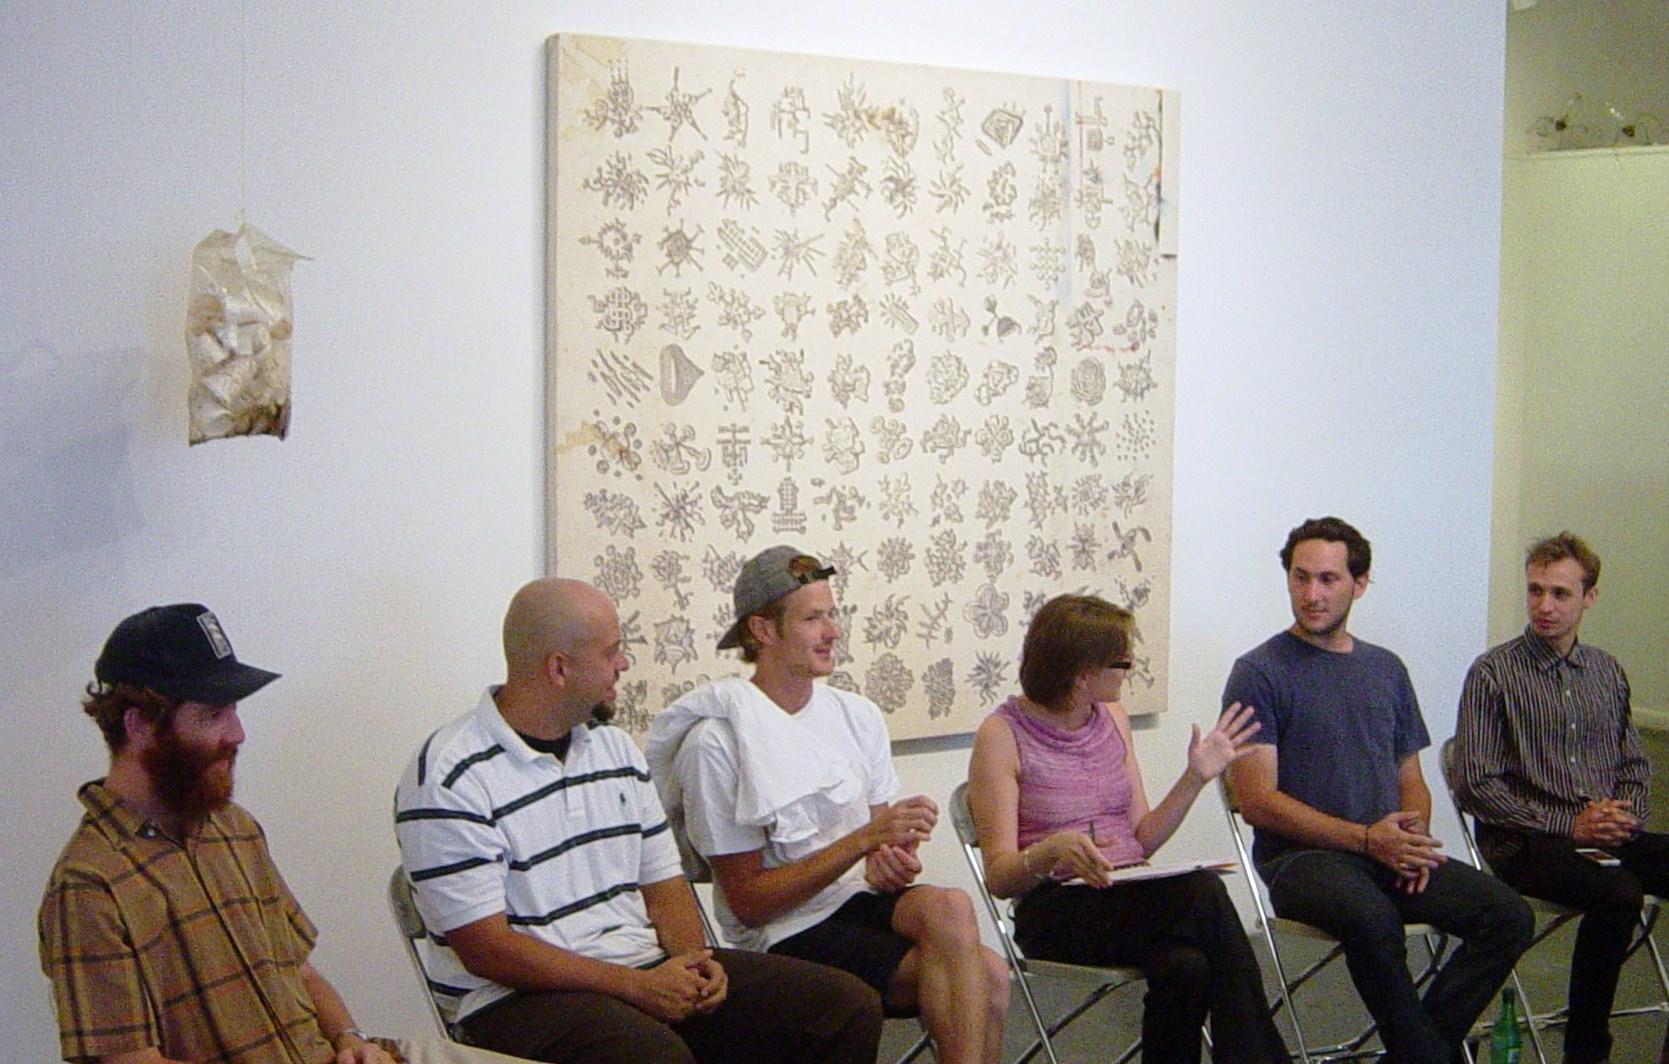 Kyle Yanagihara, Gustavo Oviedo, Tyler Healy, Susan Caraballo, Dean Levin and Evan Robarts